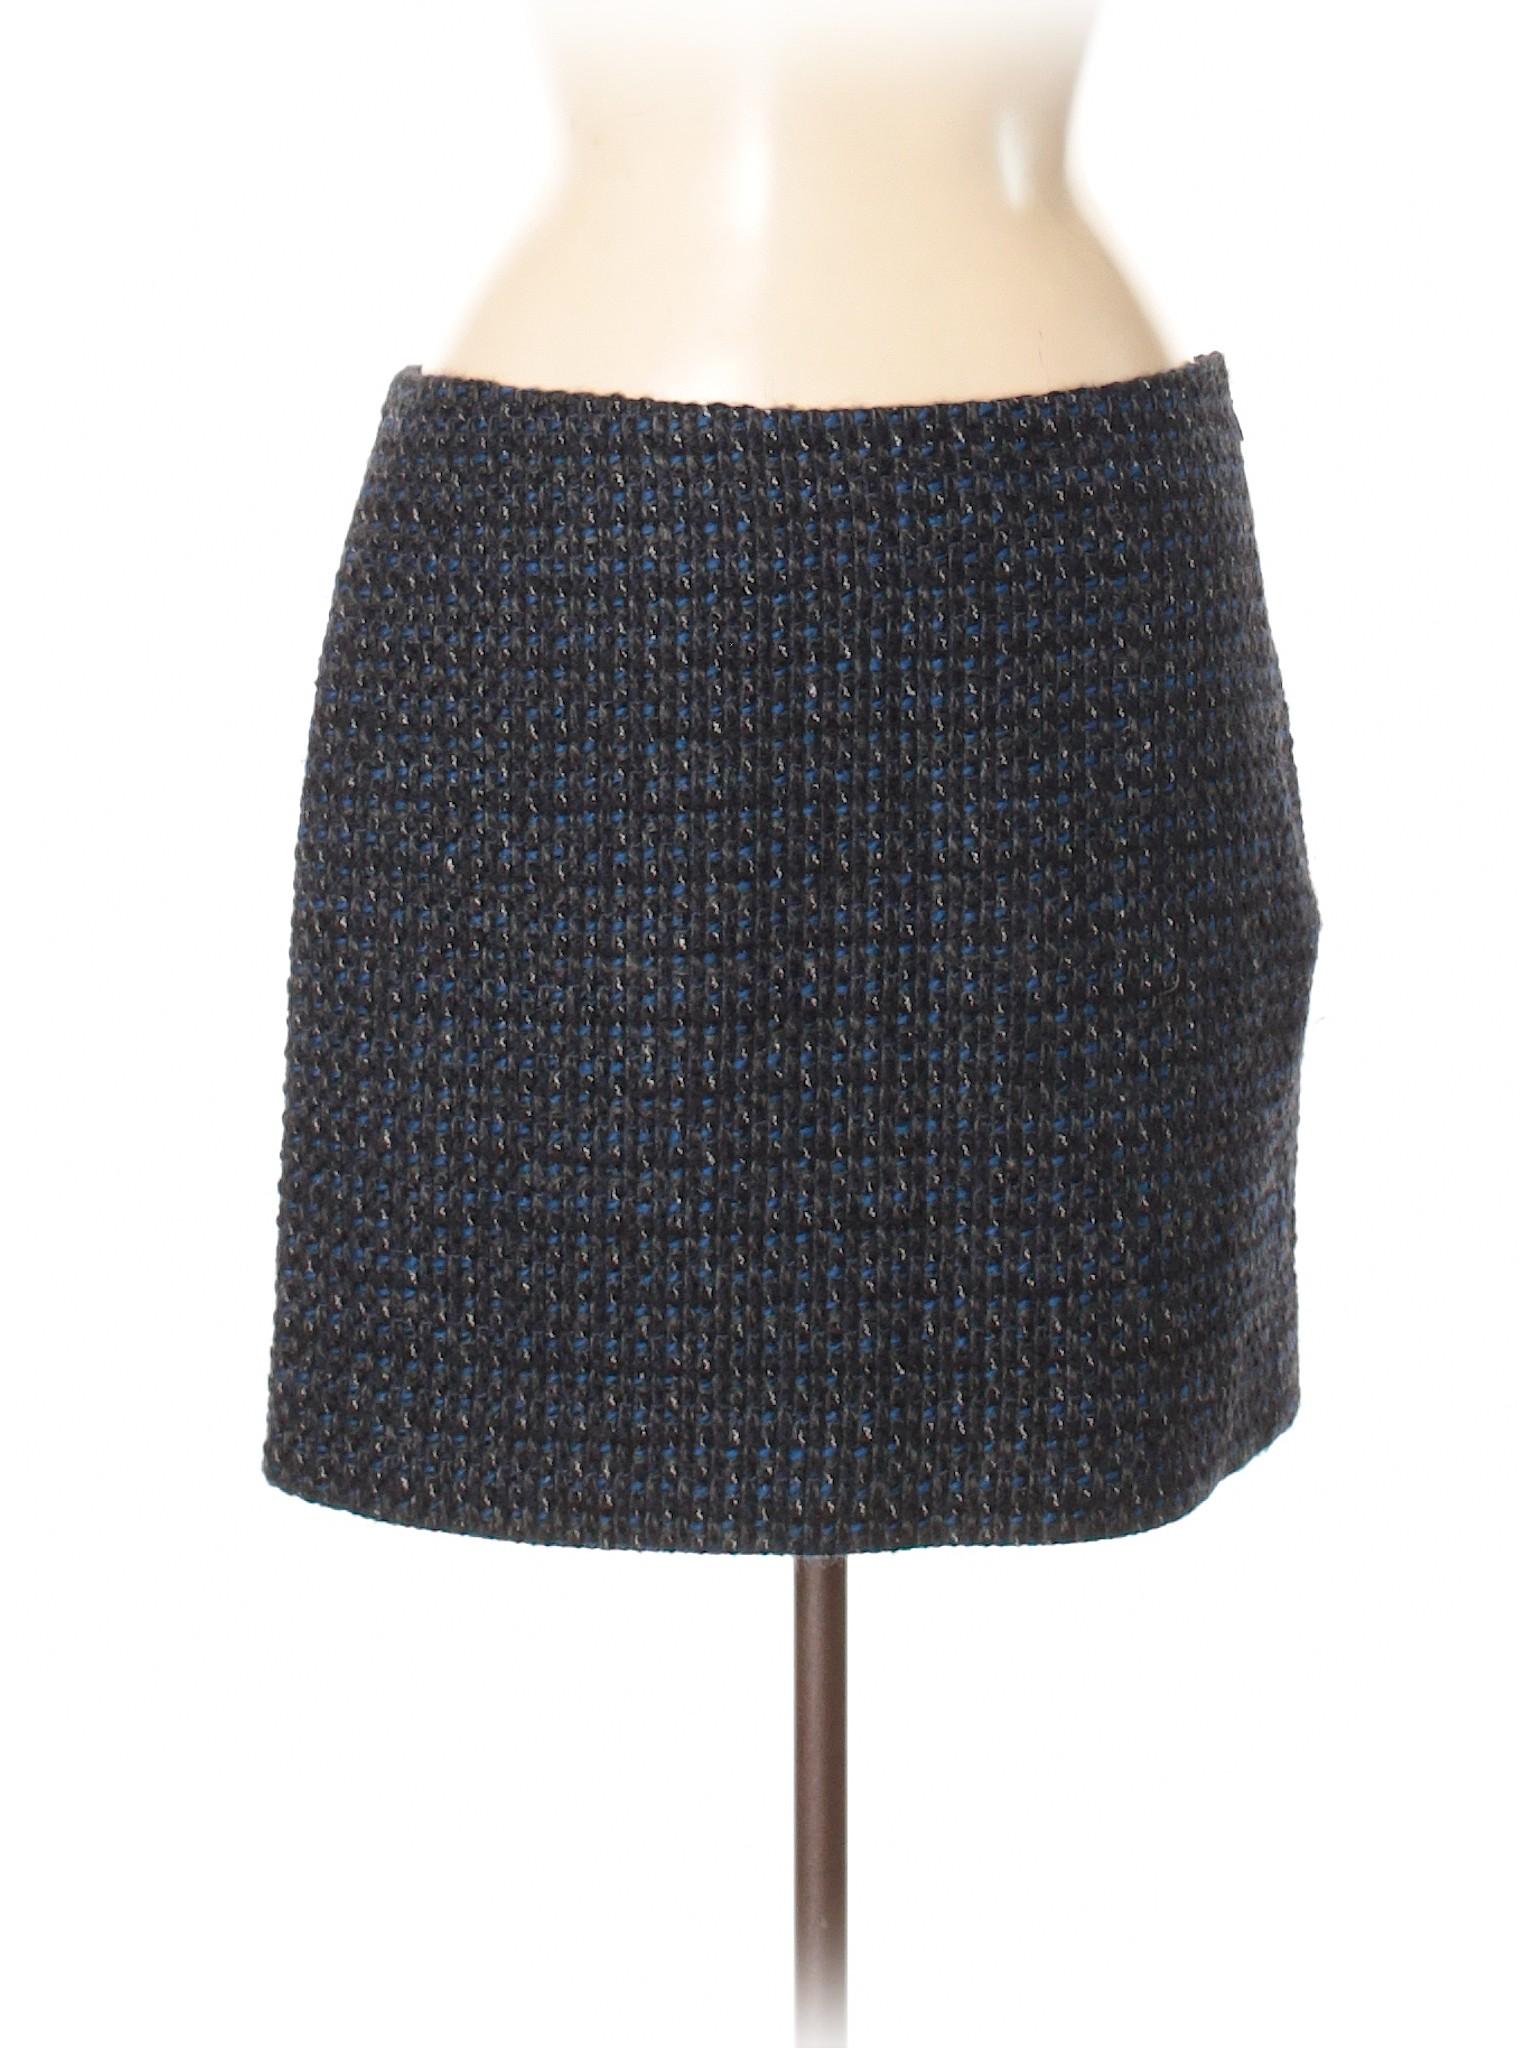 Wool Boutique Skirt Boutique Wool Wool Skirt Skirt Boutique Boutique Wool Skirt Uw7a7RqB